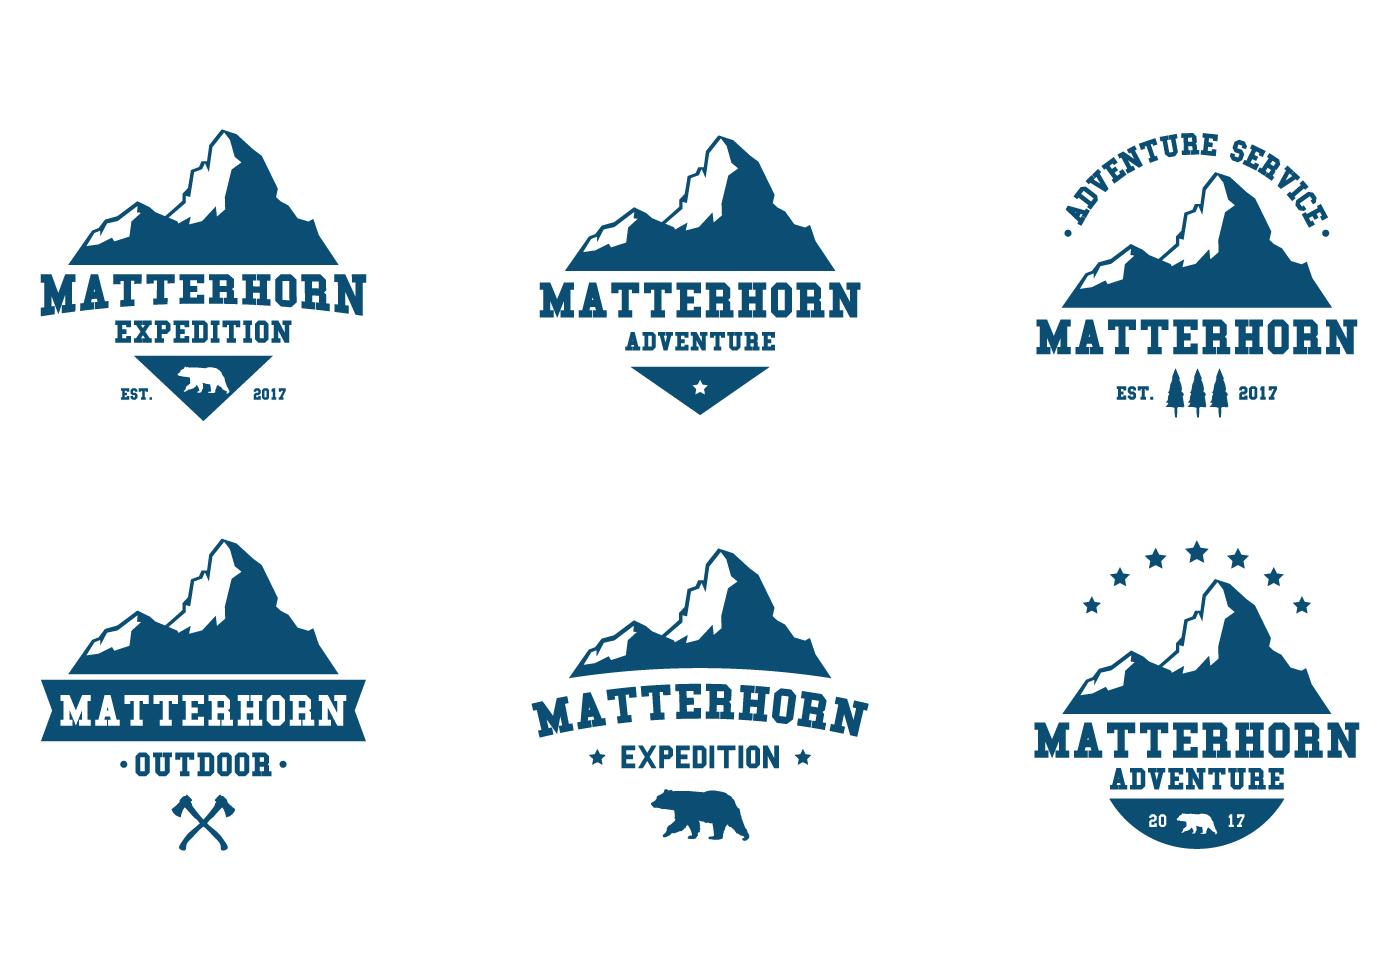 Matterhorn Adventure Label Download Free Vector Art